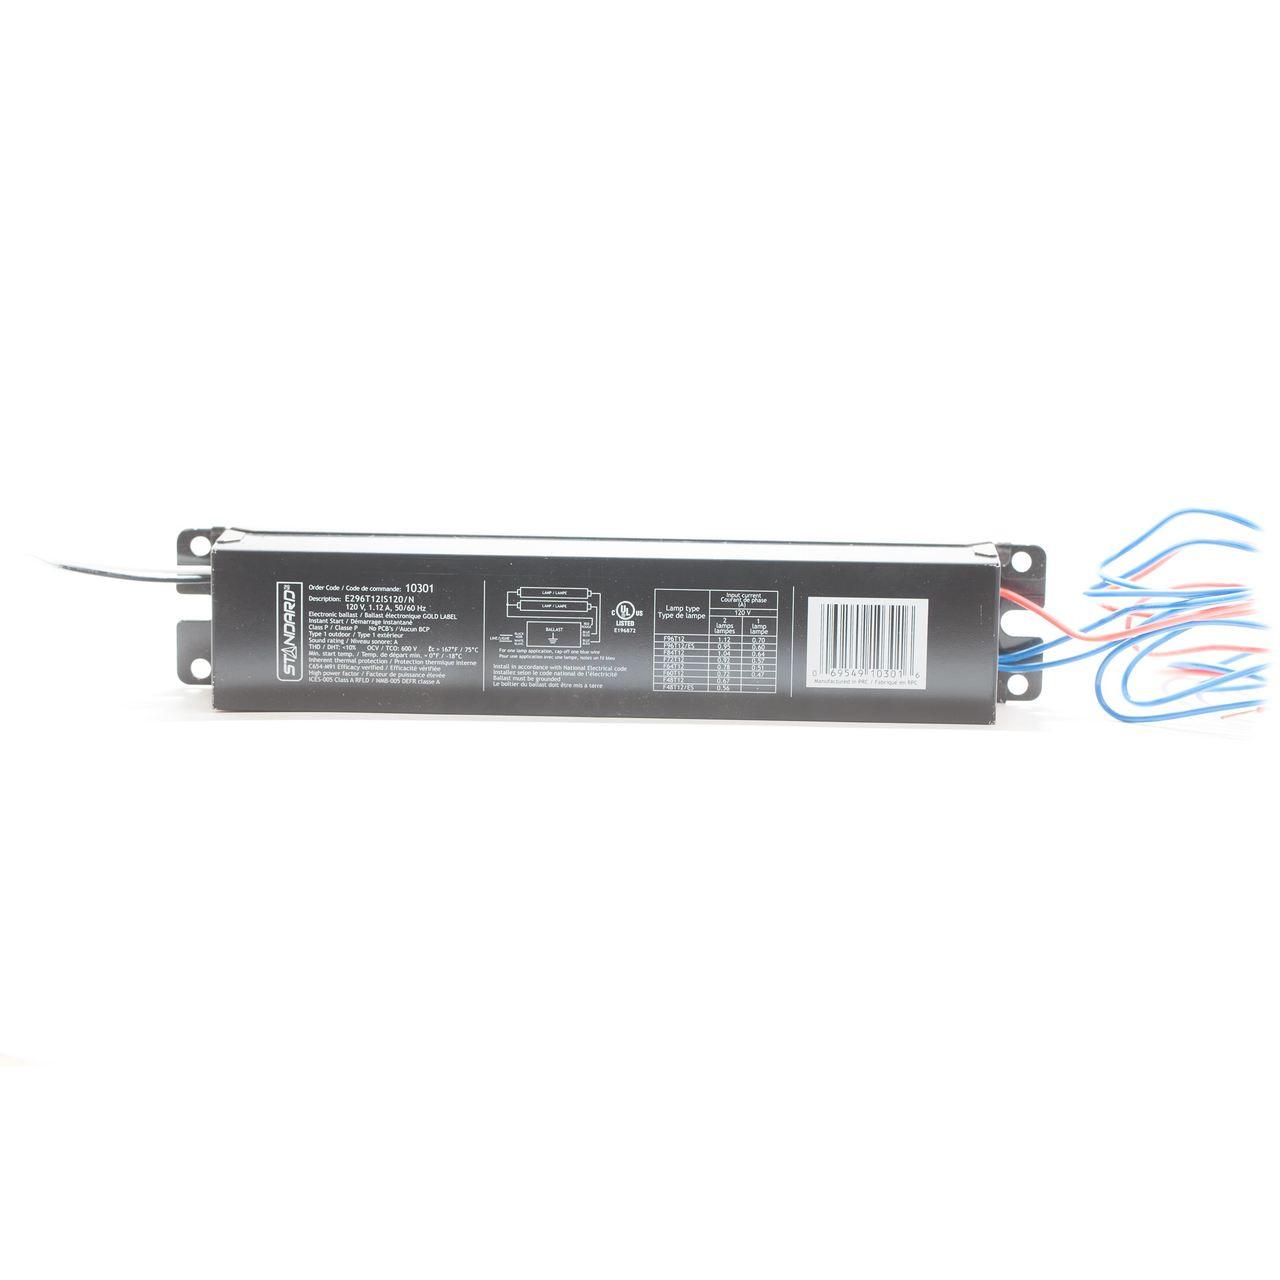 Standard 120v T12 Instant Start Electronic Ballast 1 2 Tubes T96 120 Volt Wiring Diagram